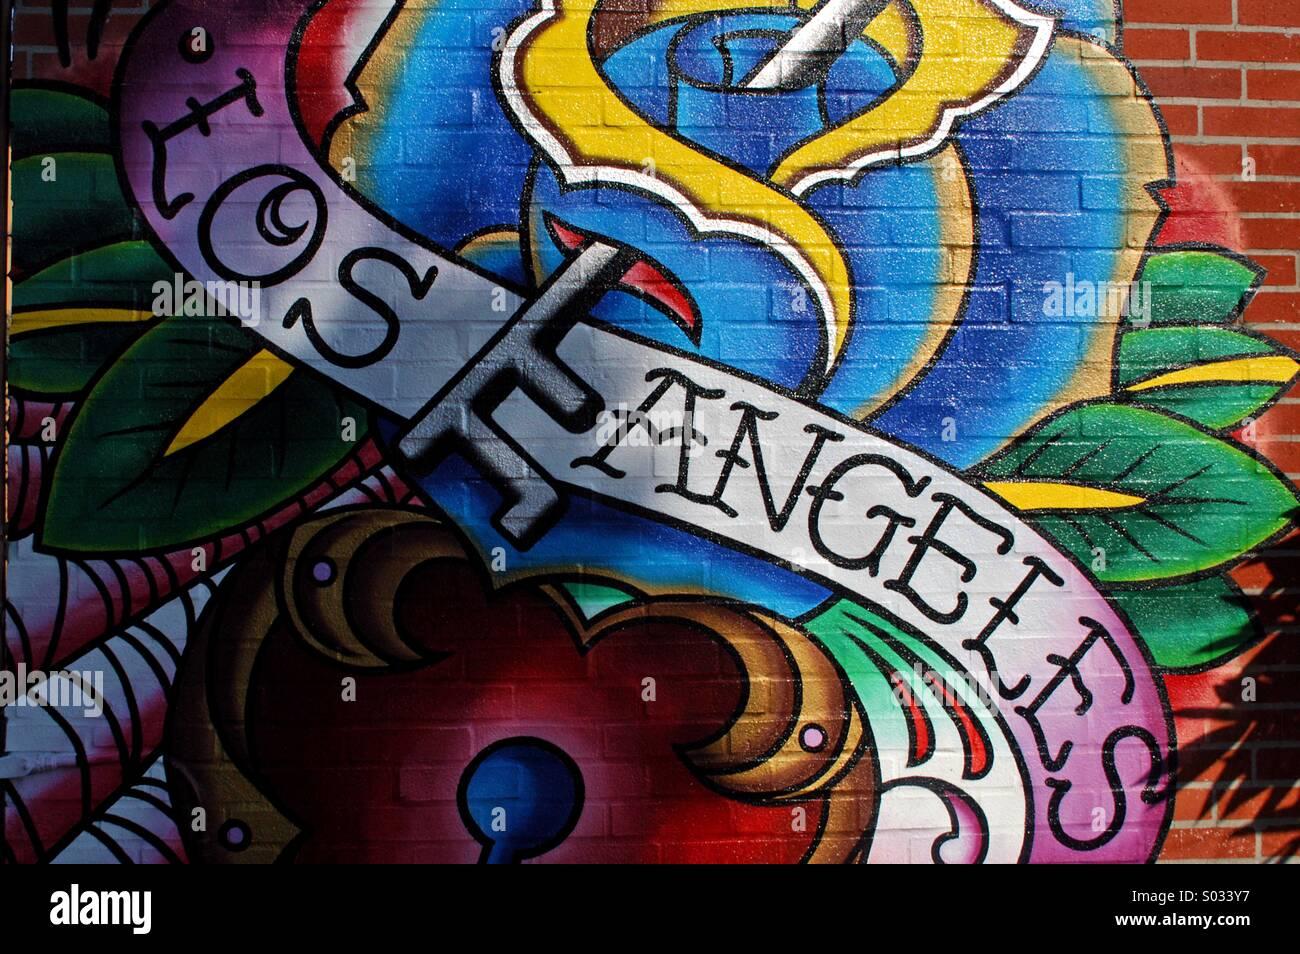 Los Angeles graffiti, off Melrose, LA Stock Photo